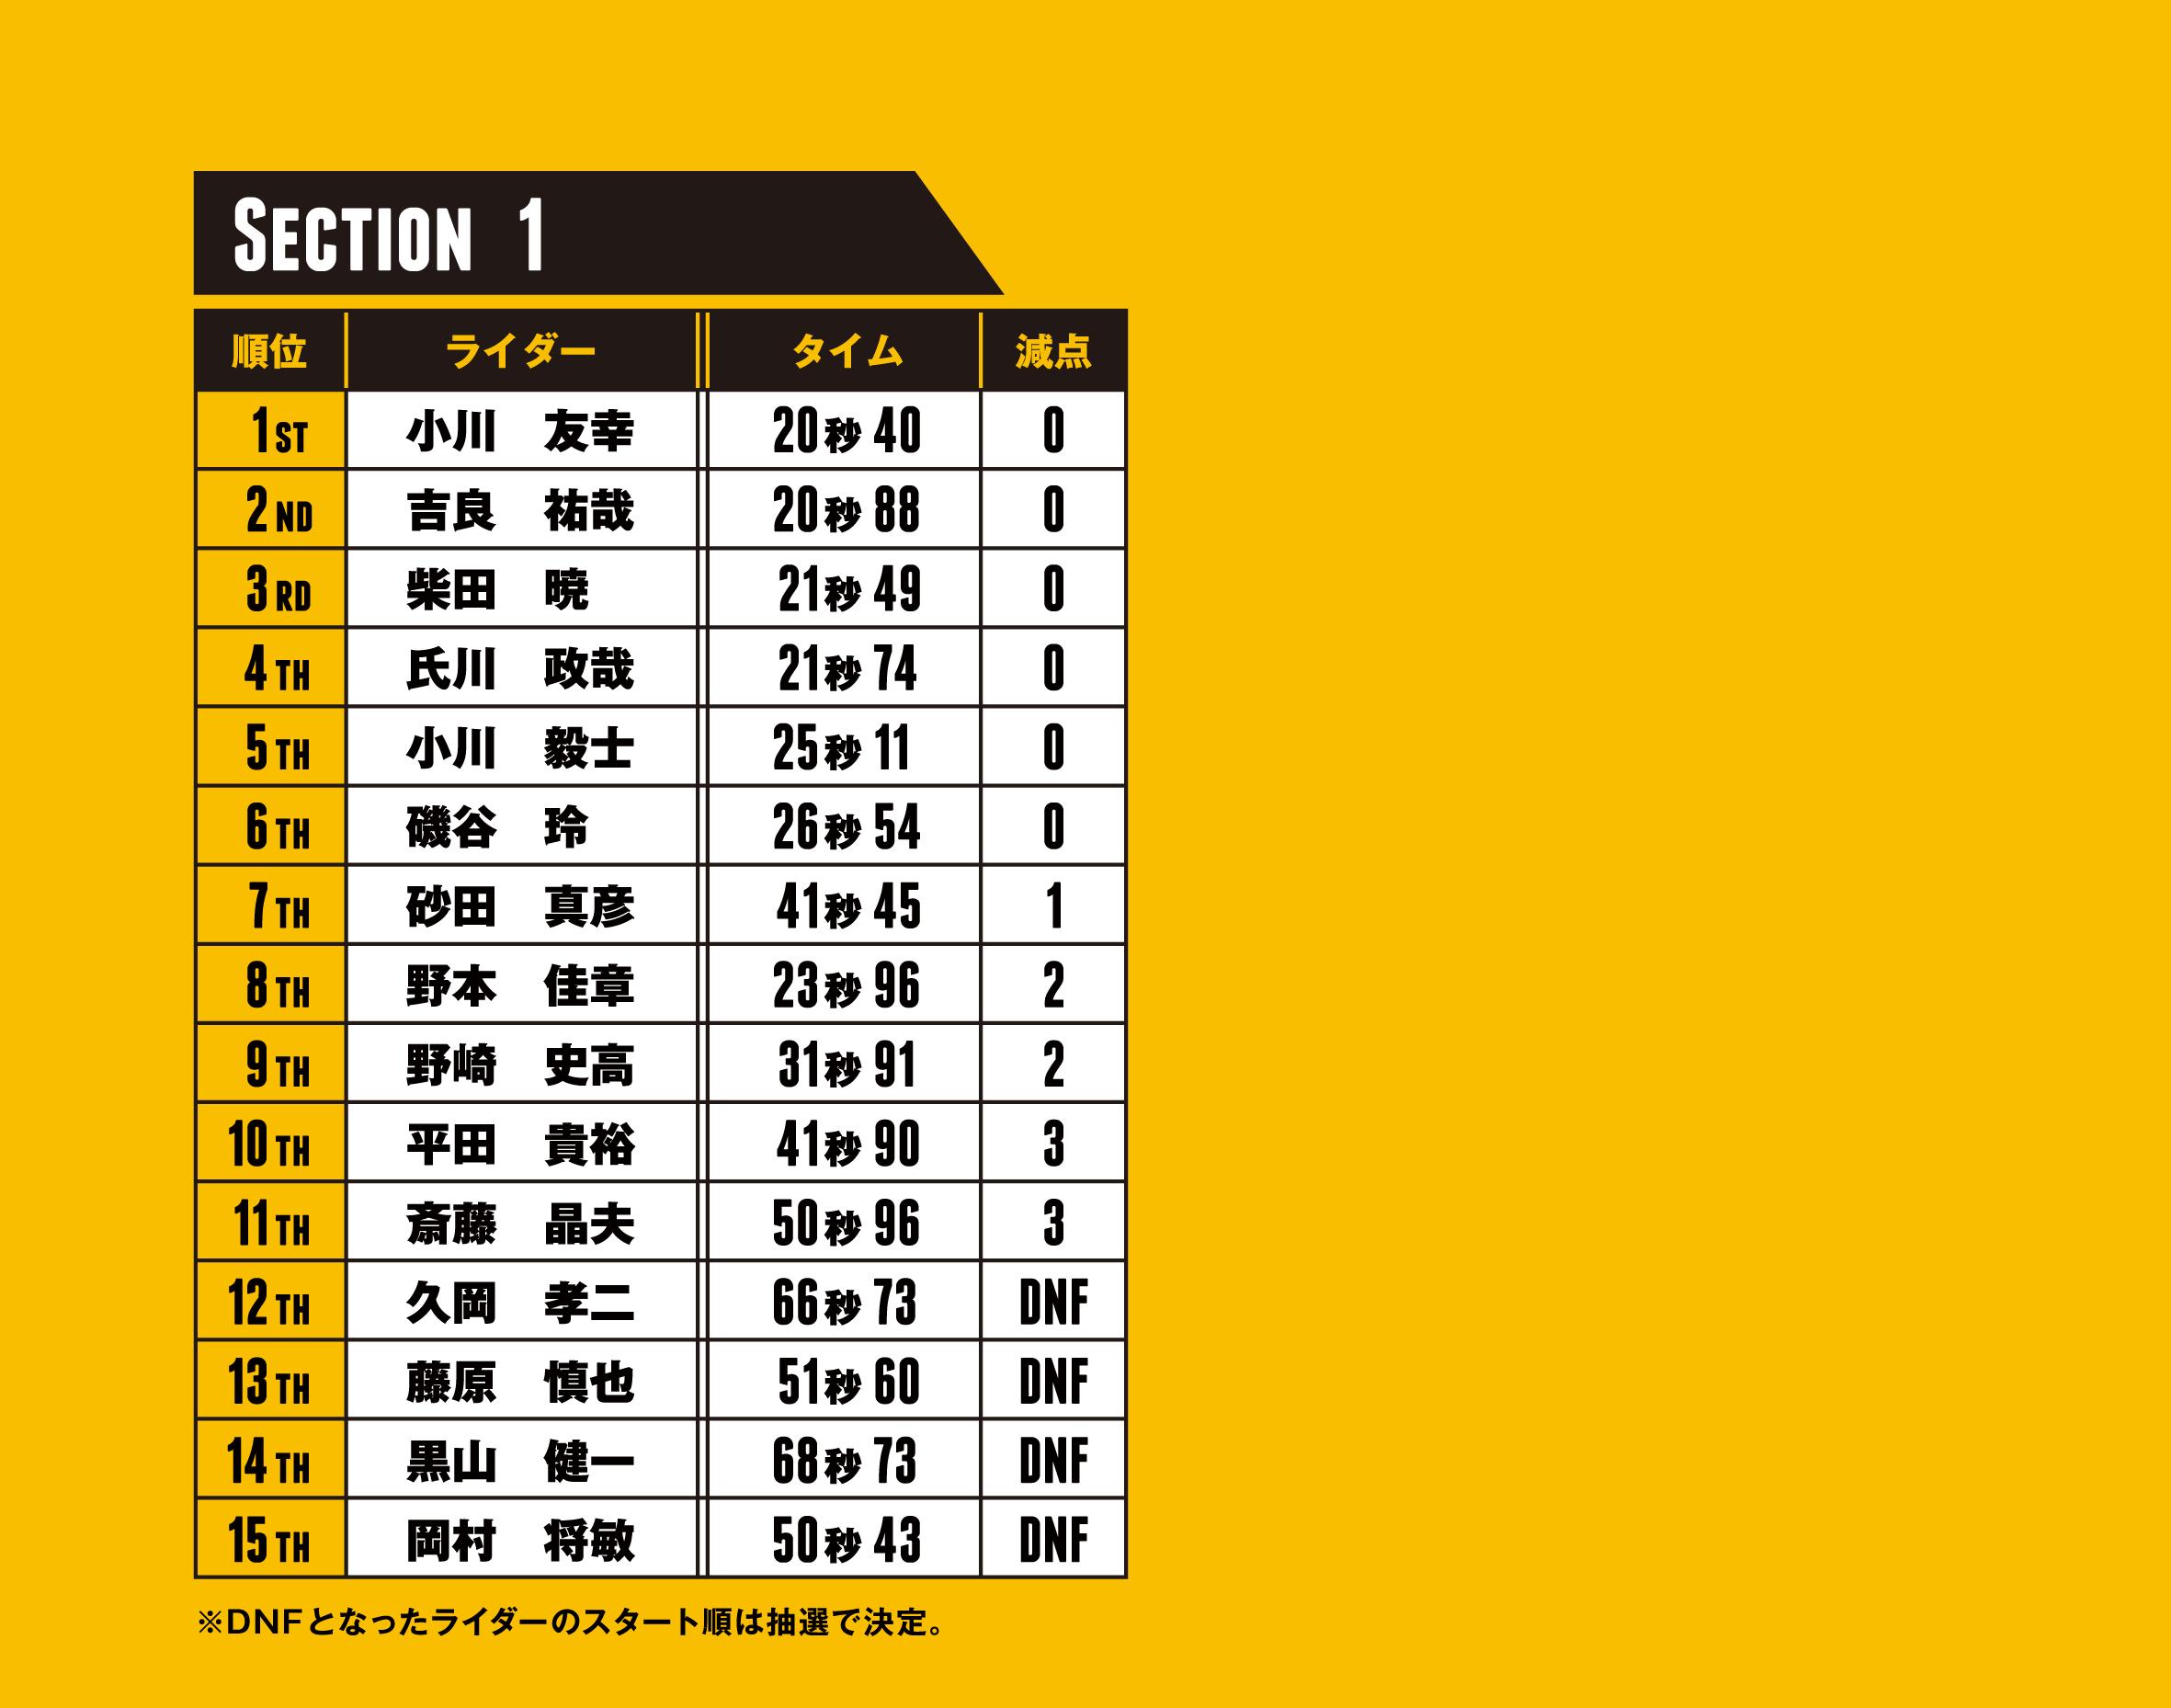 ctj2018 result section1